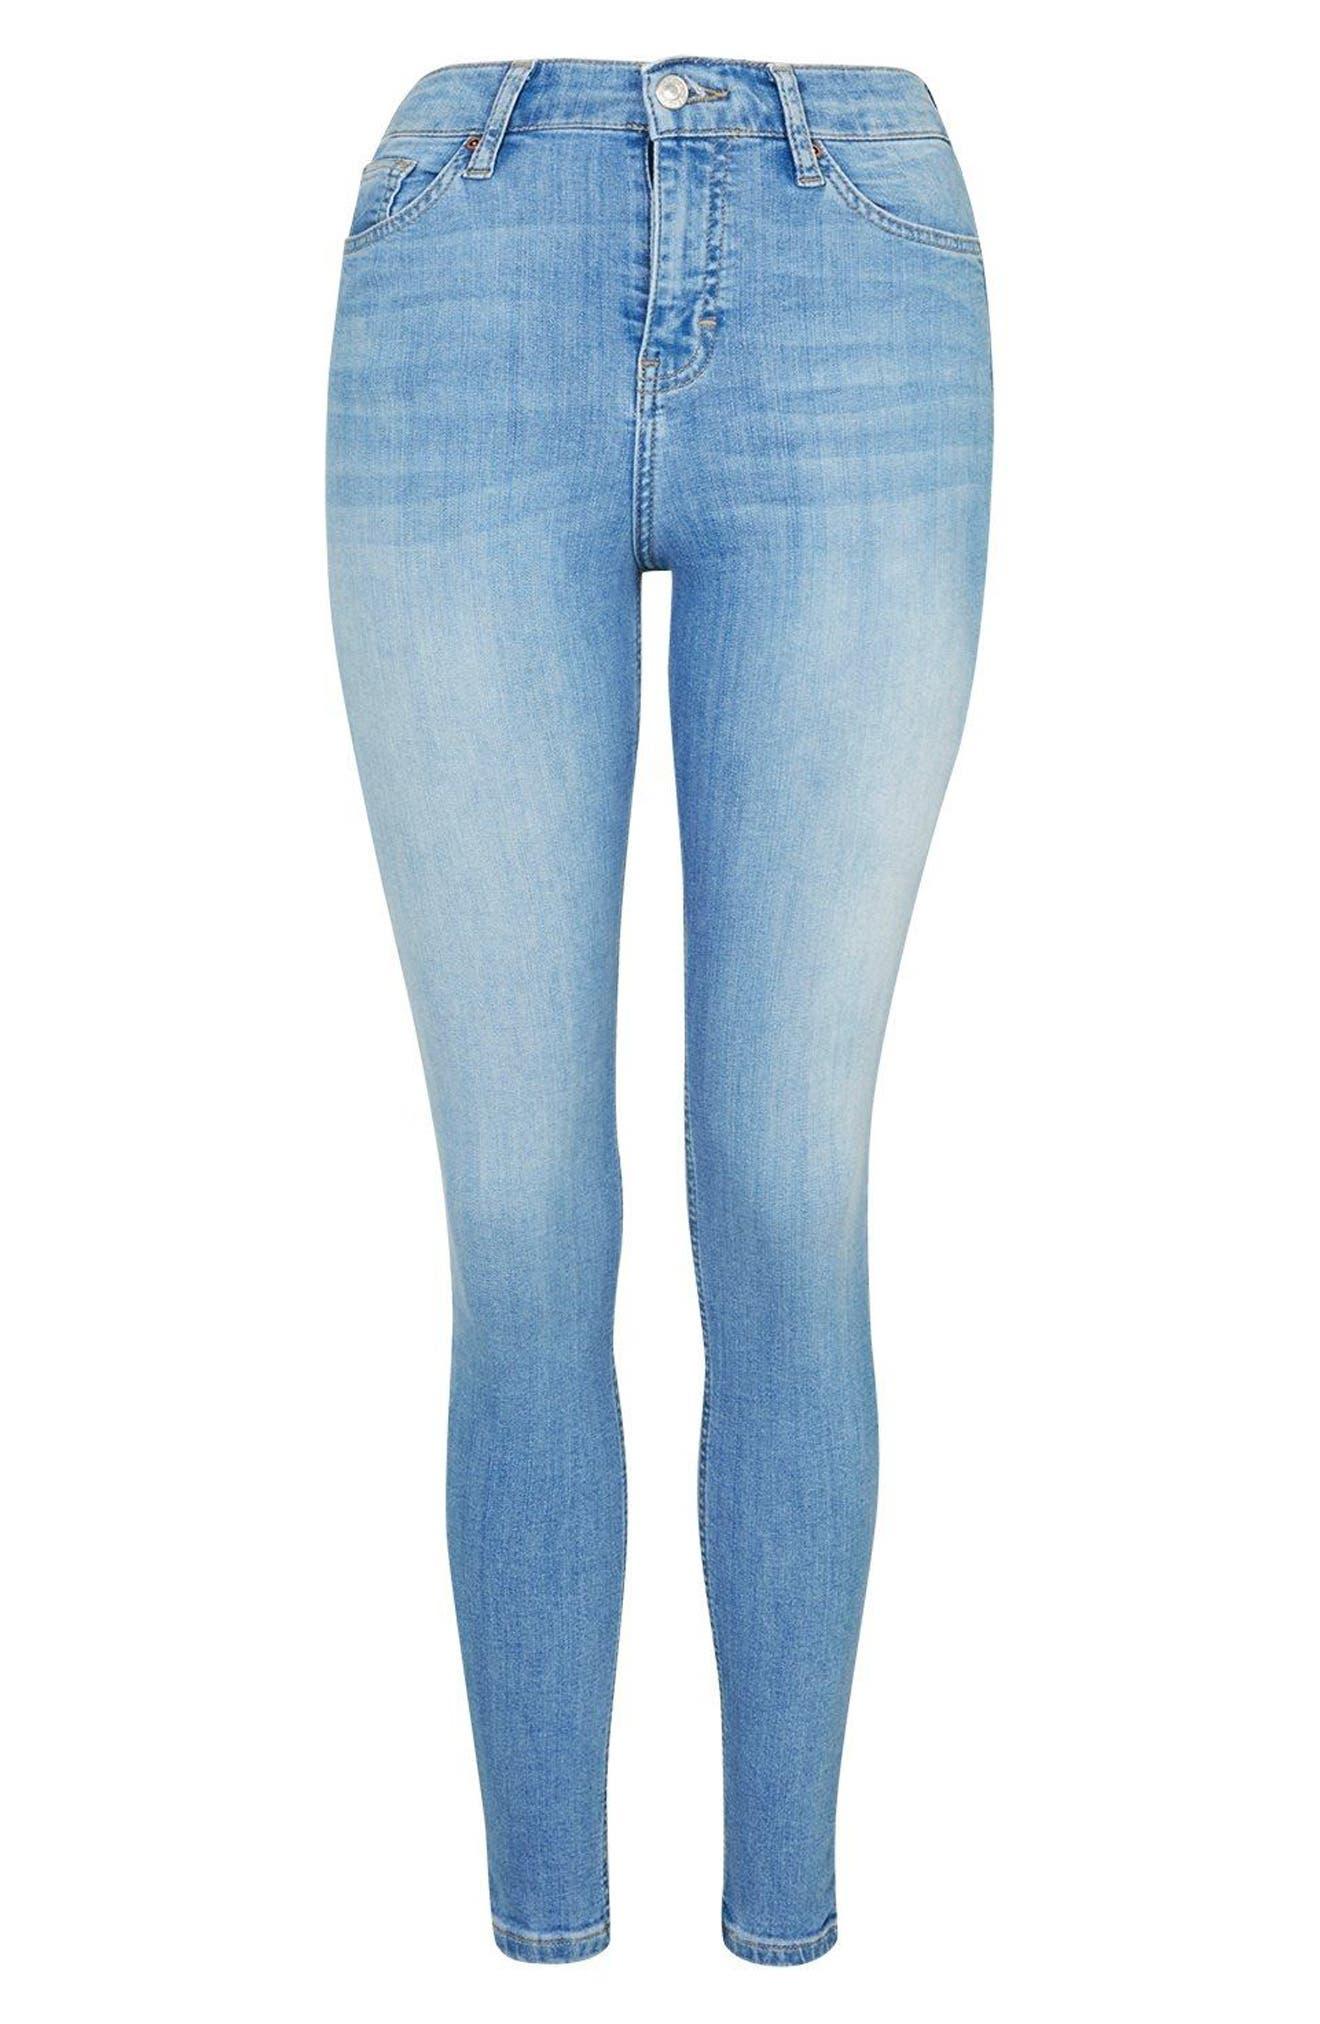 TOPSHOP, Moto Jamie High Waist Skinny Jeans, Alternate thumbnail 5, color, 450